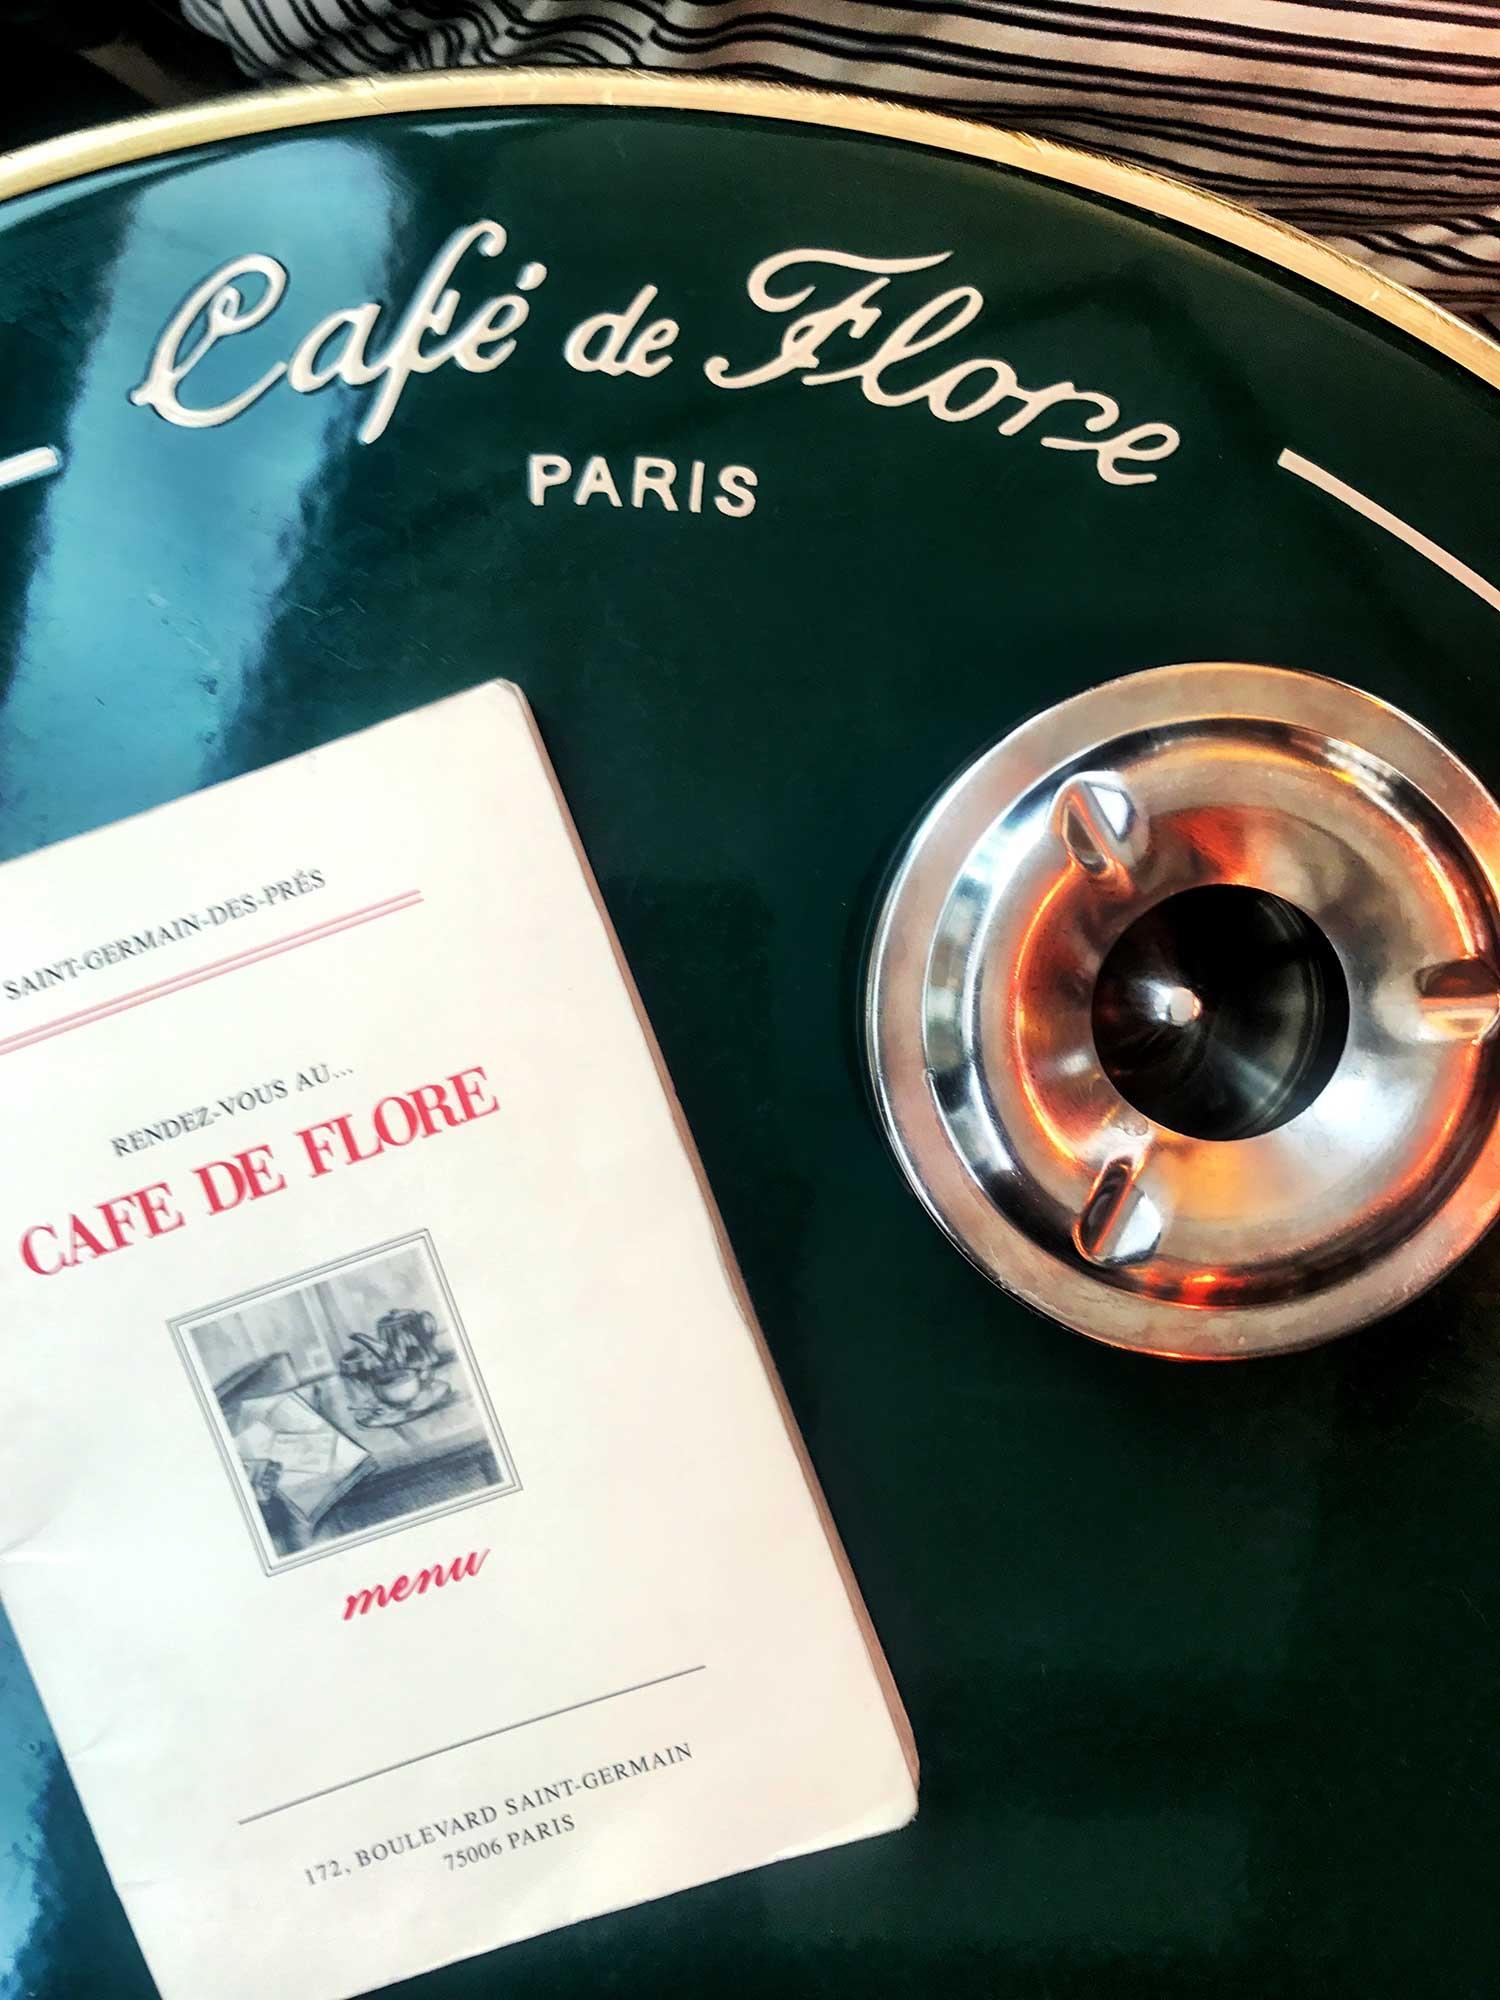 The menu at Café de Flore. December 2018